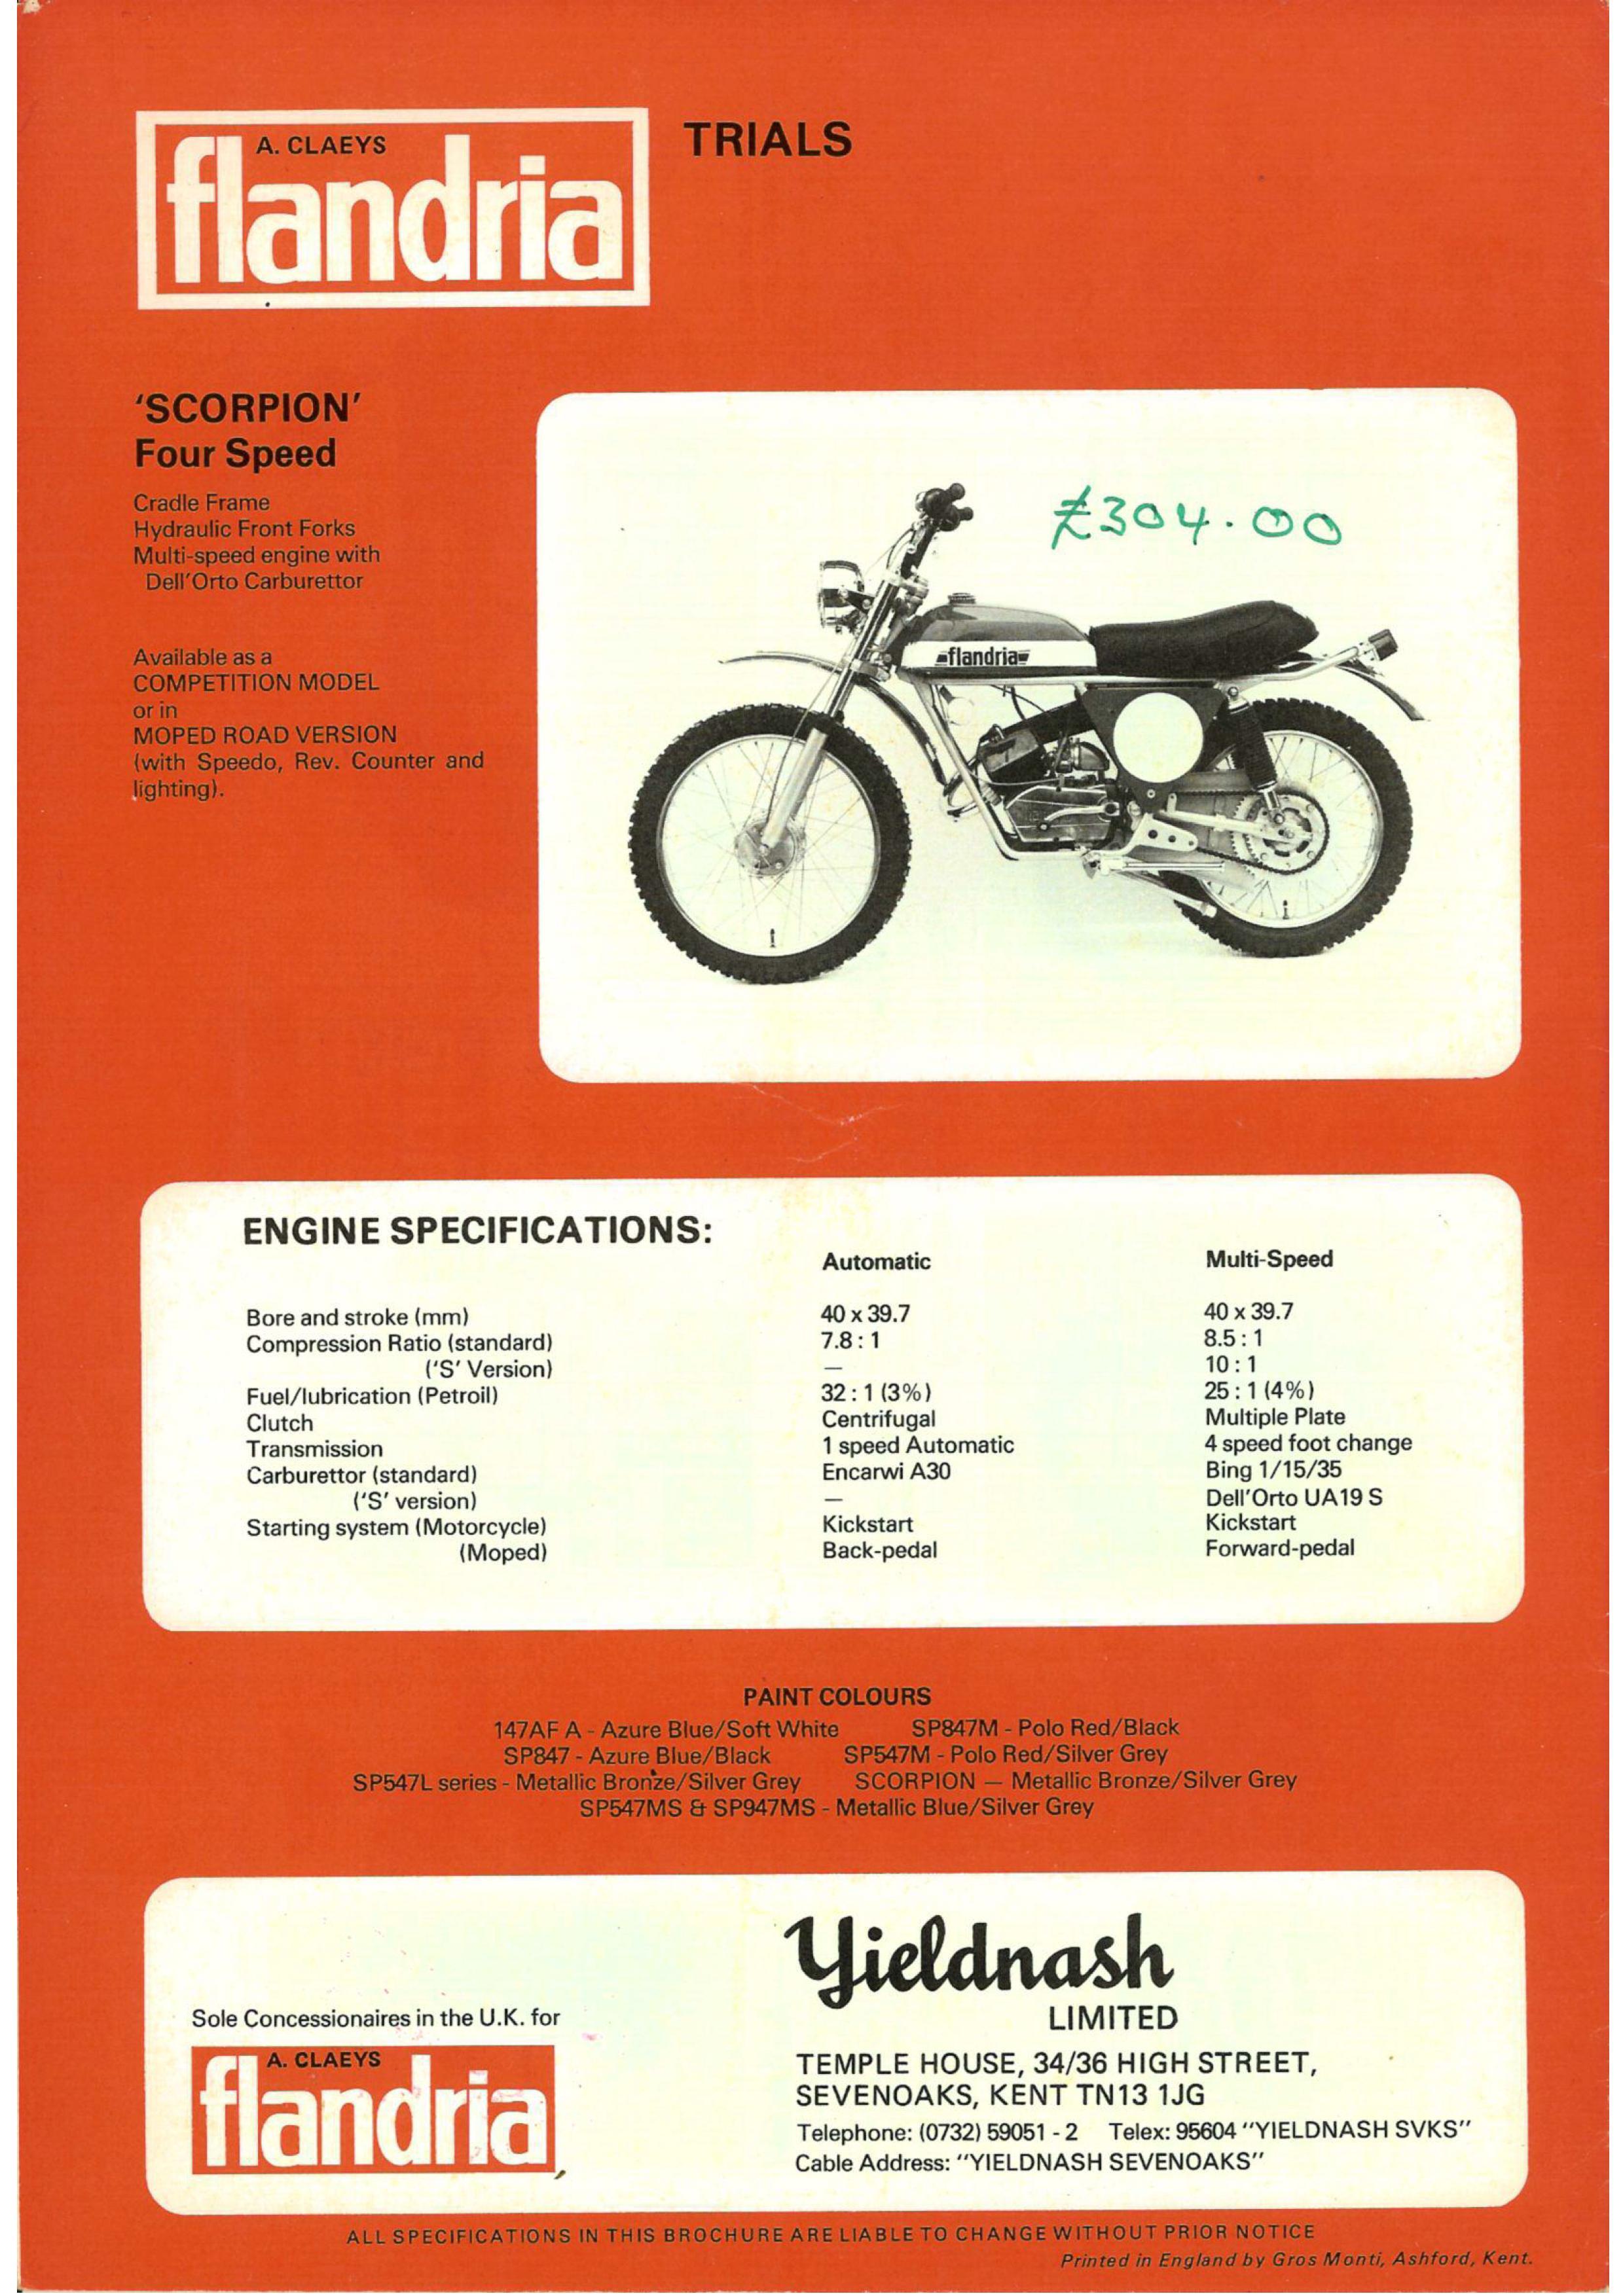 FLANDRIA SCORPION Flandr66